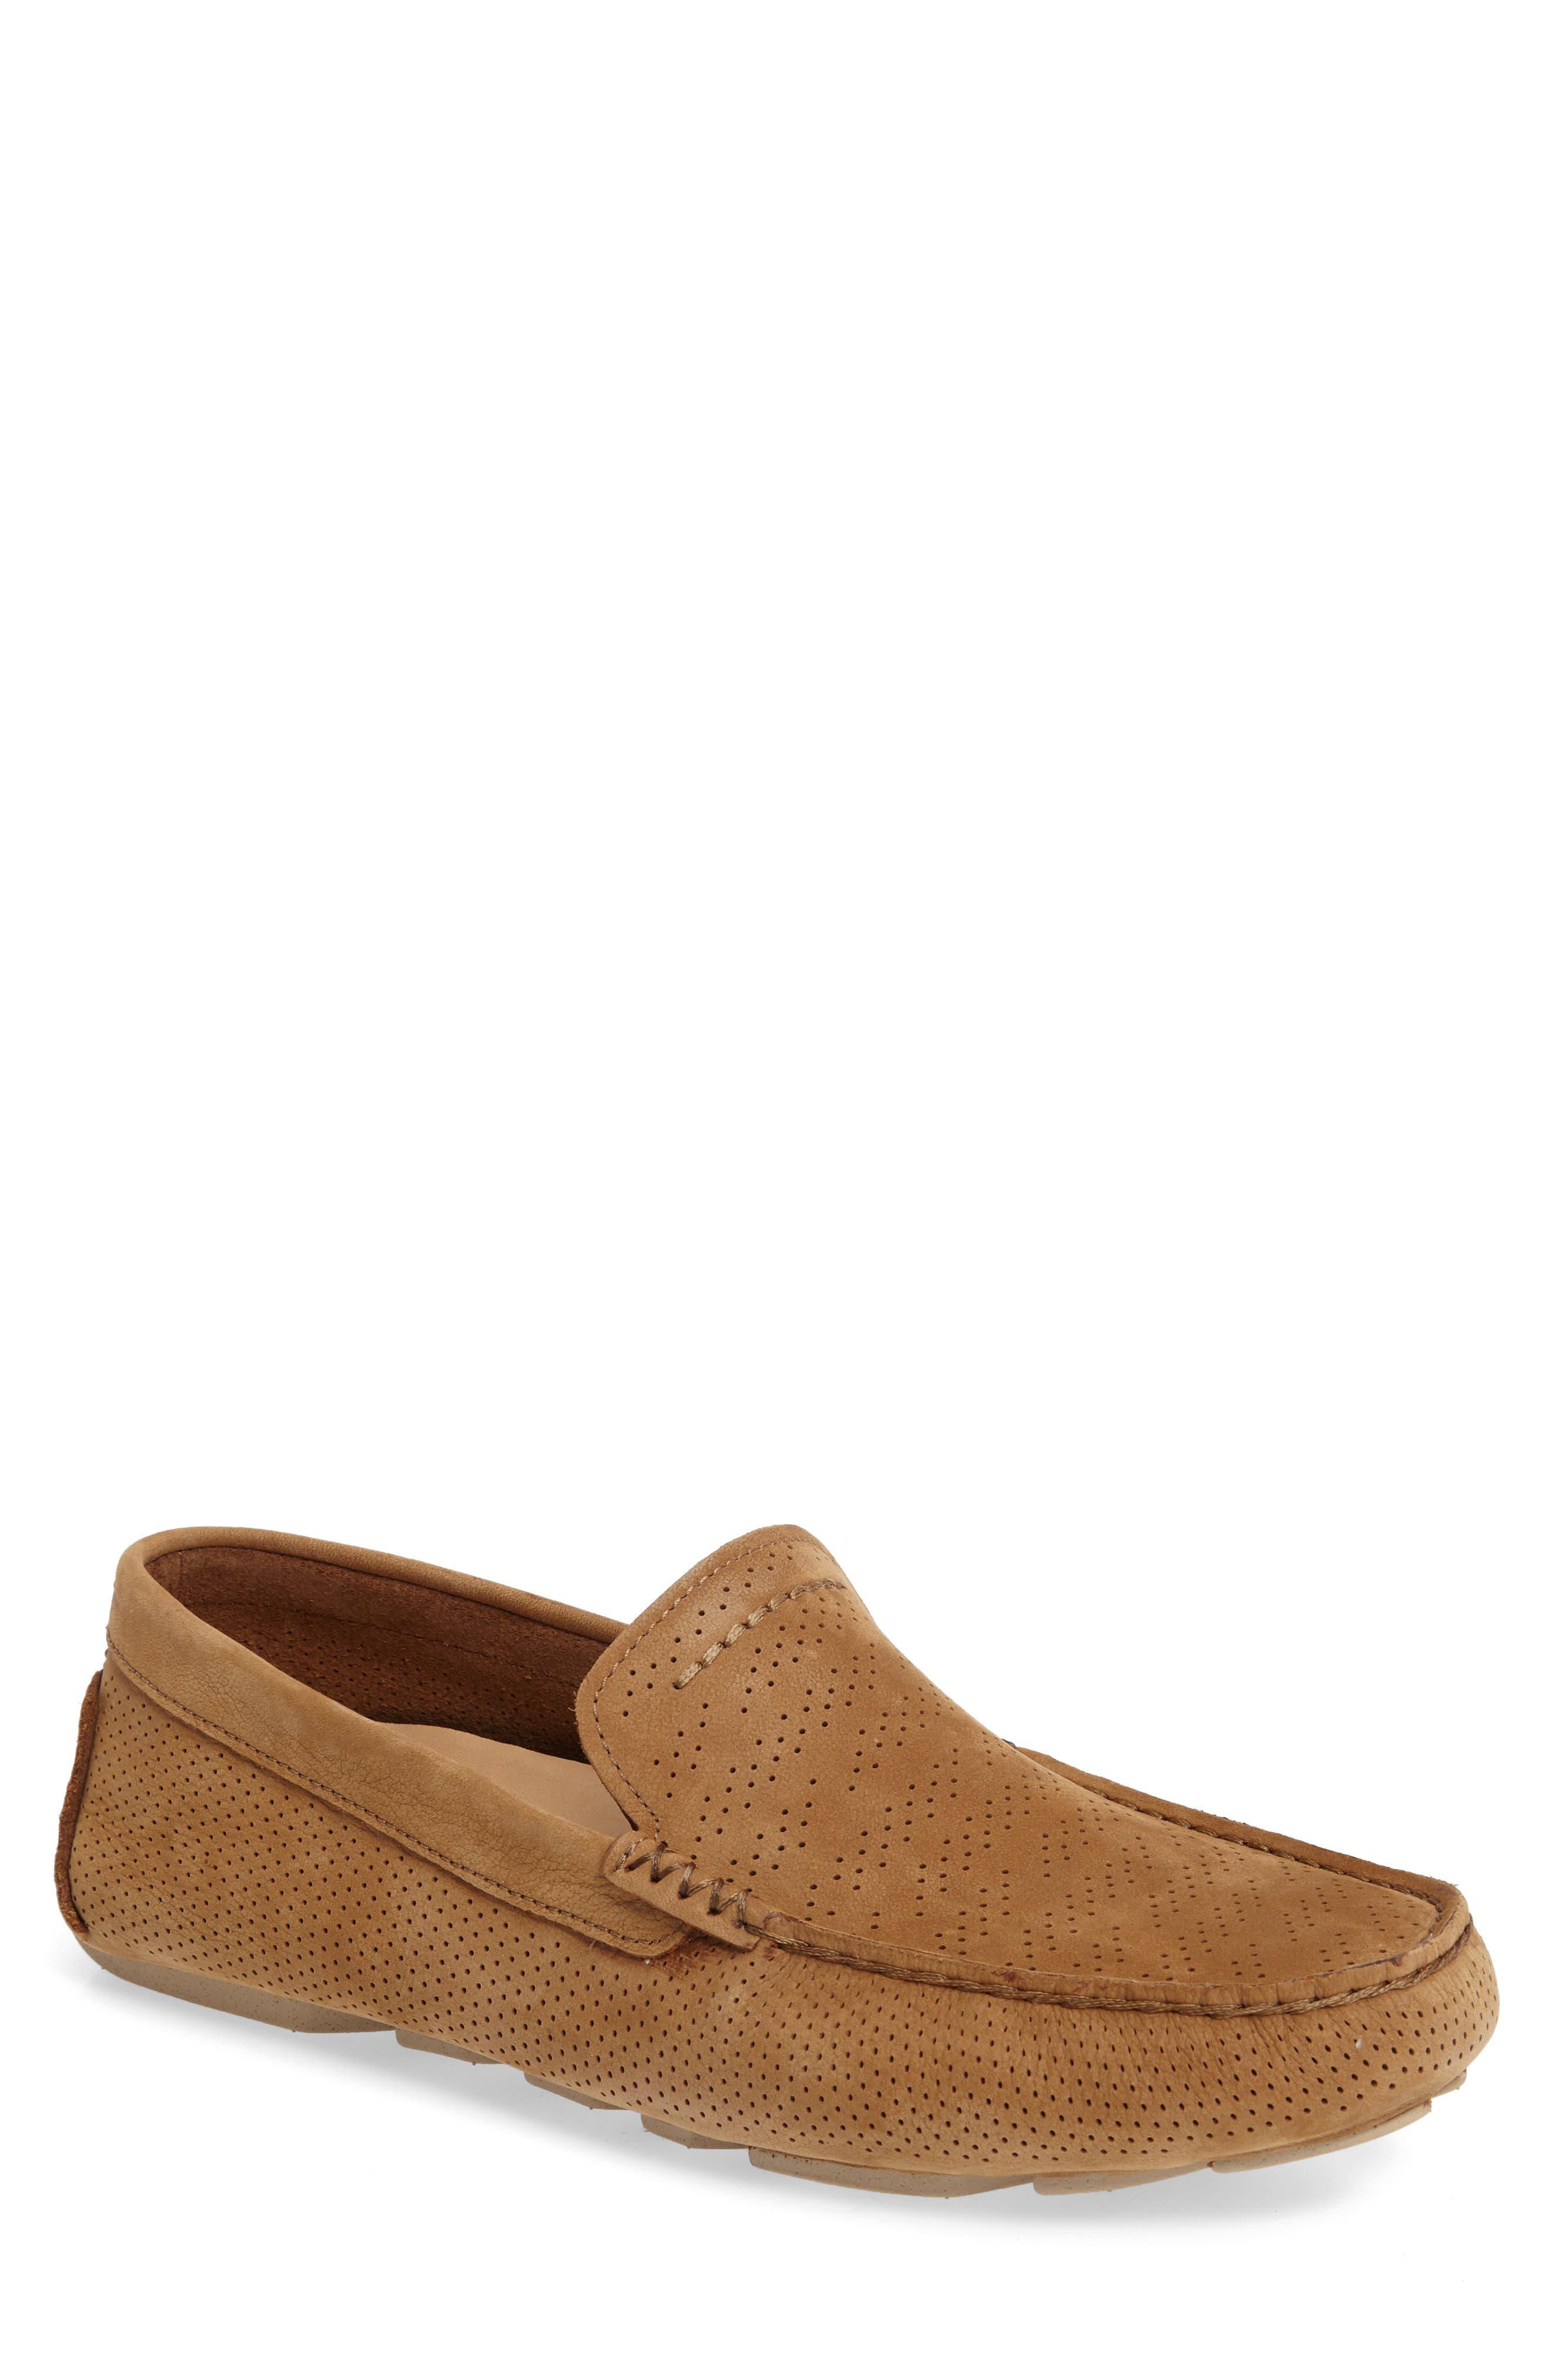 Henrick Twinsole<sup>®</sup> Driving Shoe,                             Main thumbnail 1, color,                             Tamarind